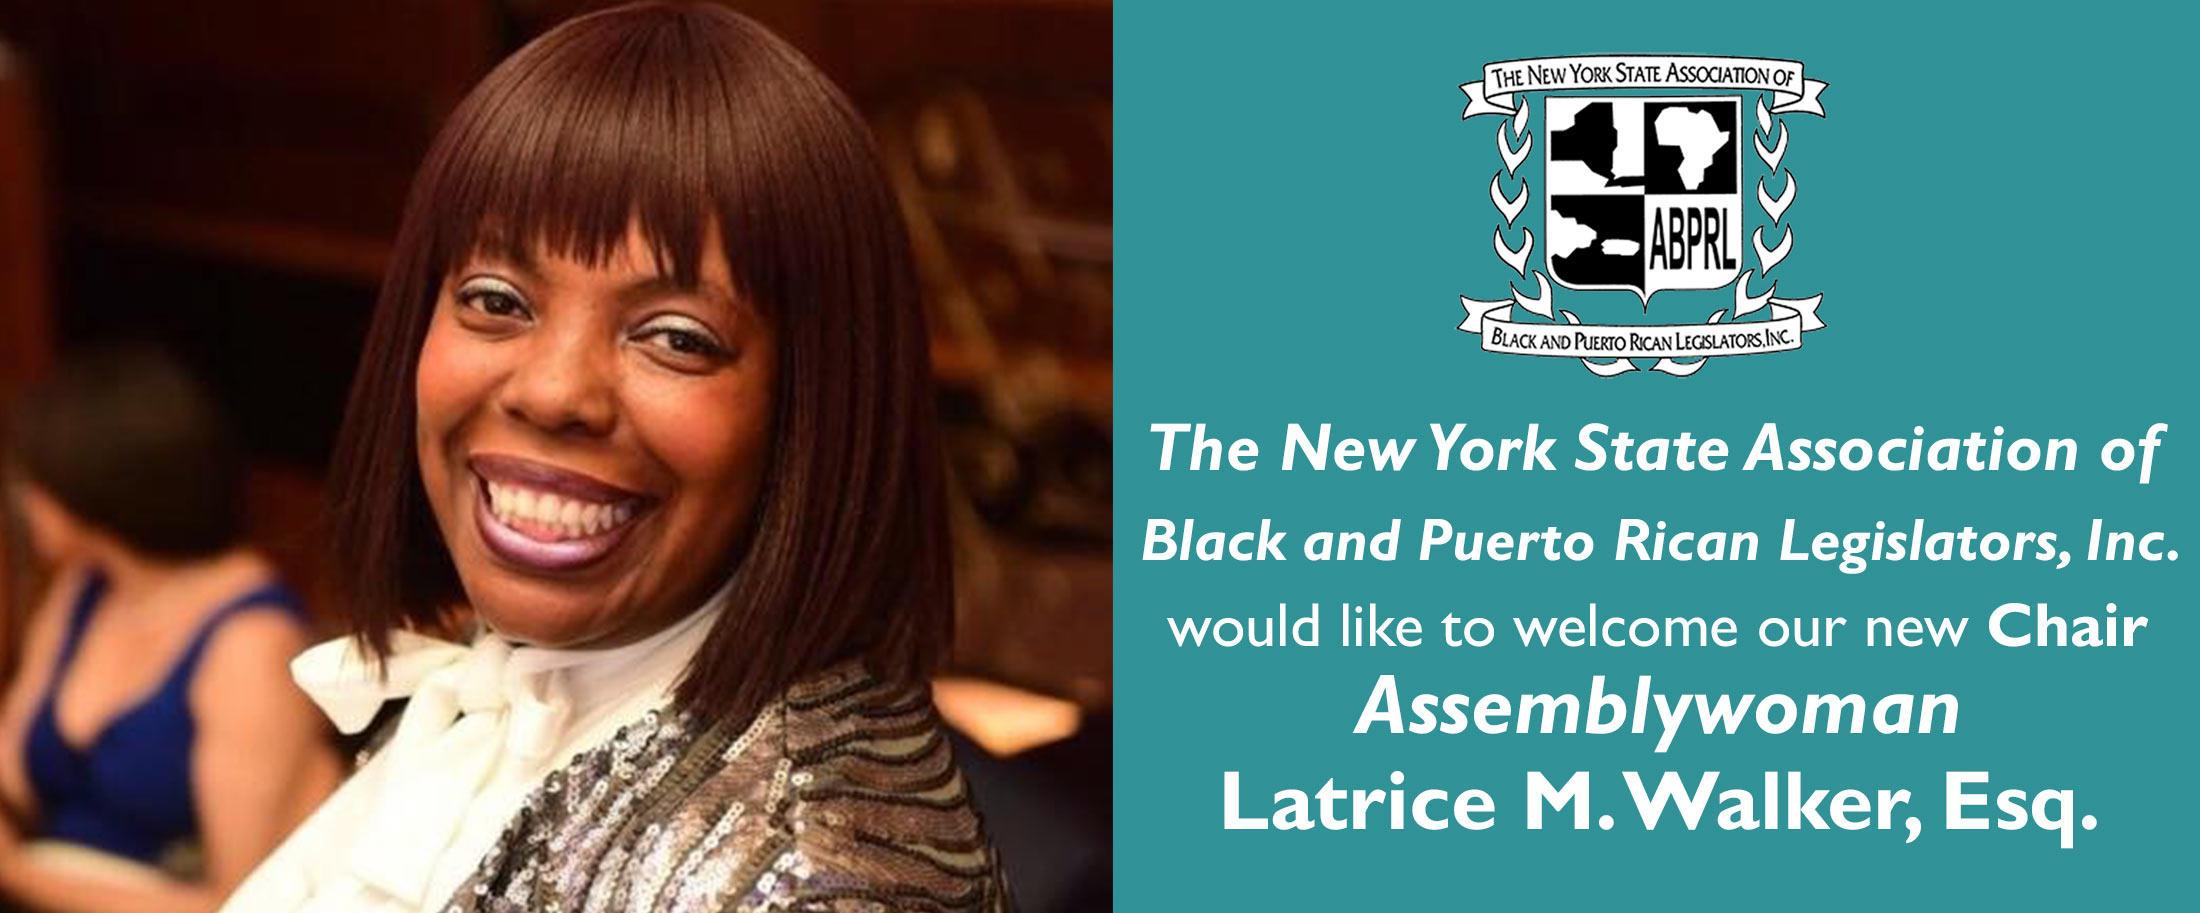 The New York State Association of Black and Puerto Rican Legislators, Inc. image 0